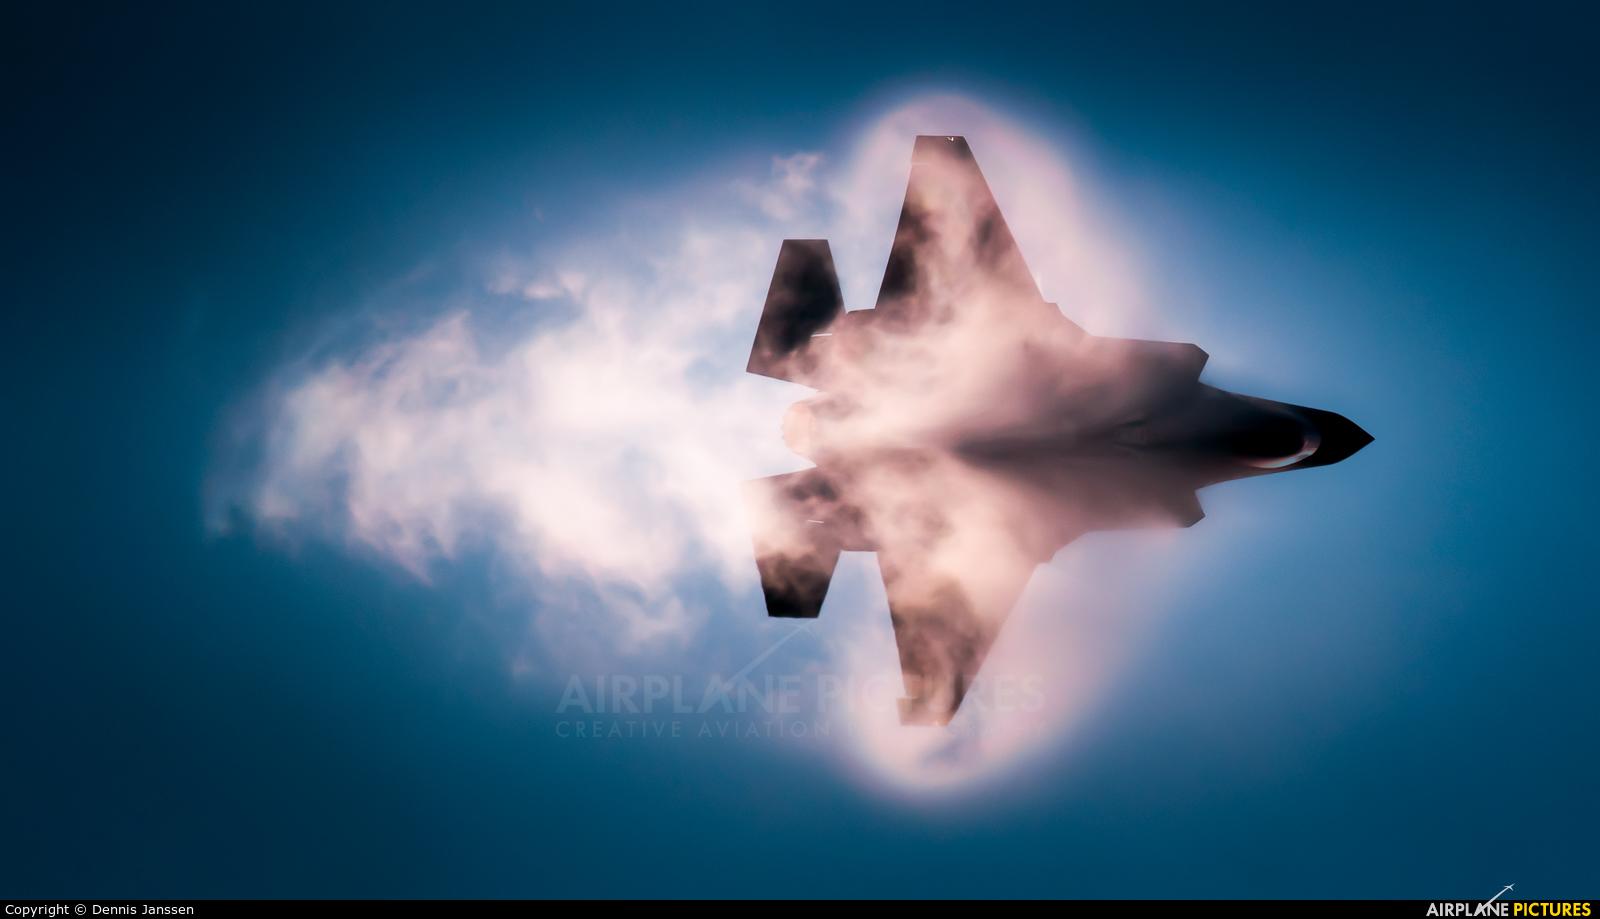 USA - Air Force 15-5125 aircraft at Fairford